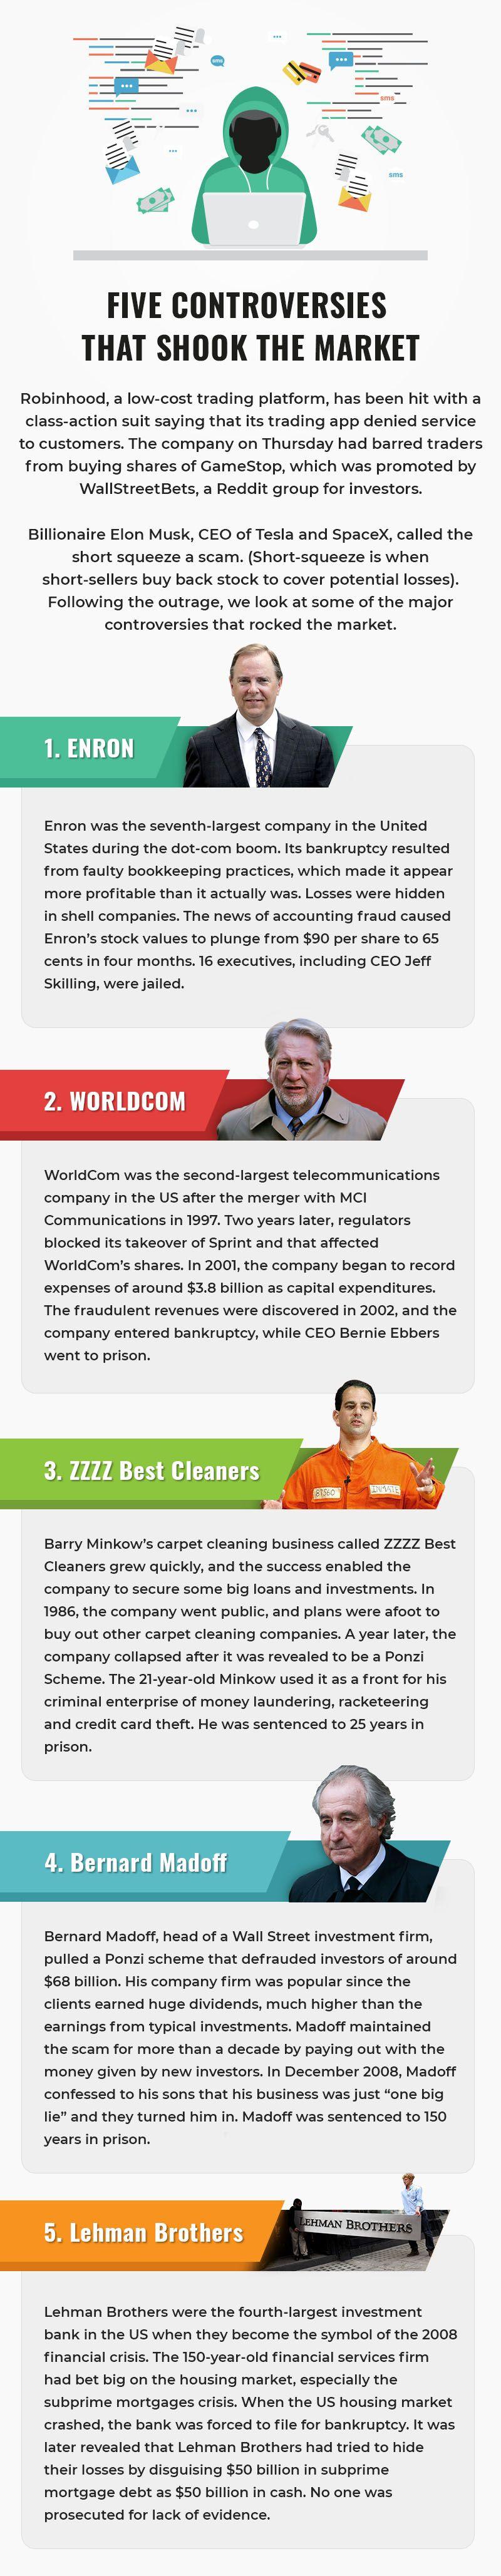 Top market scams